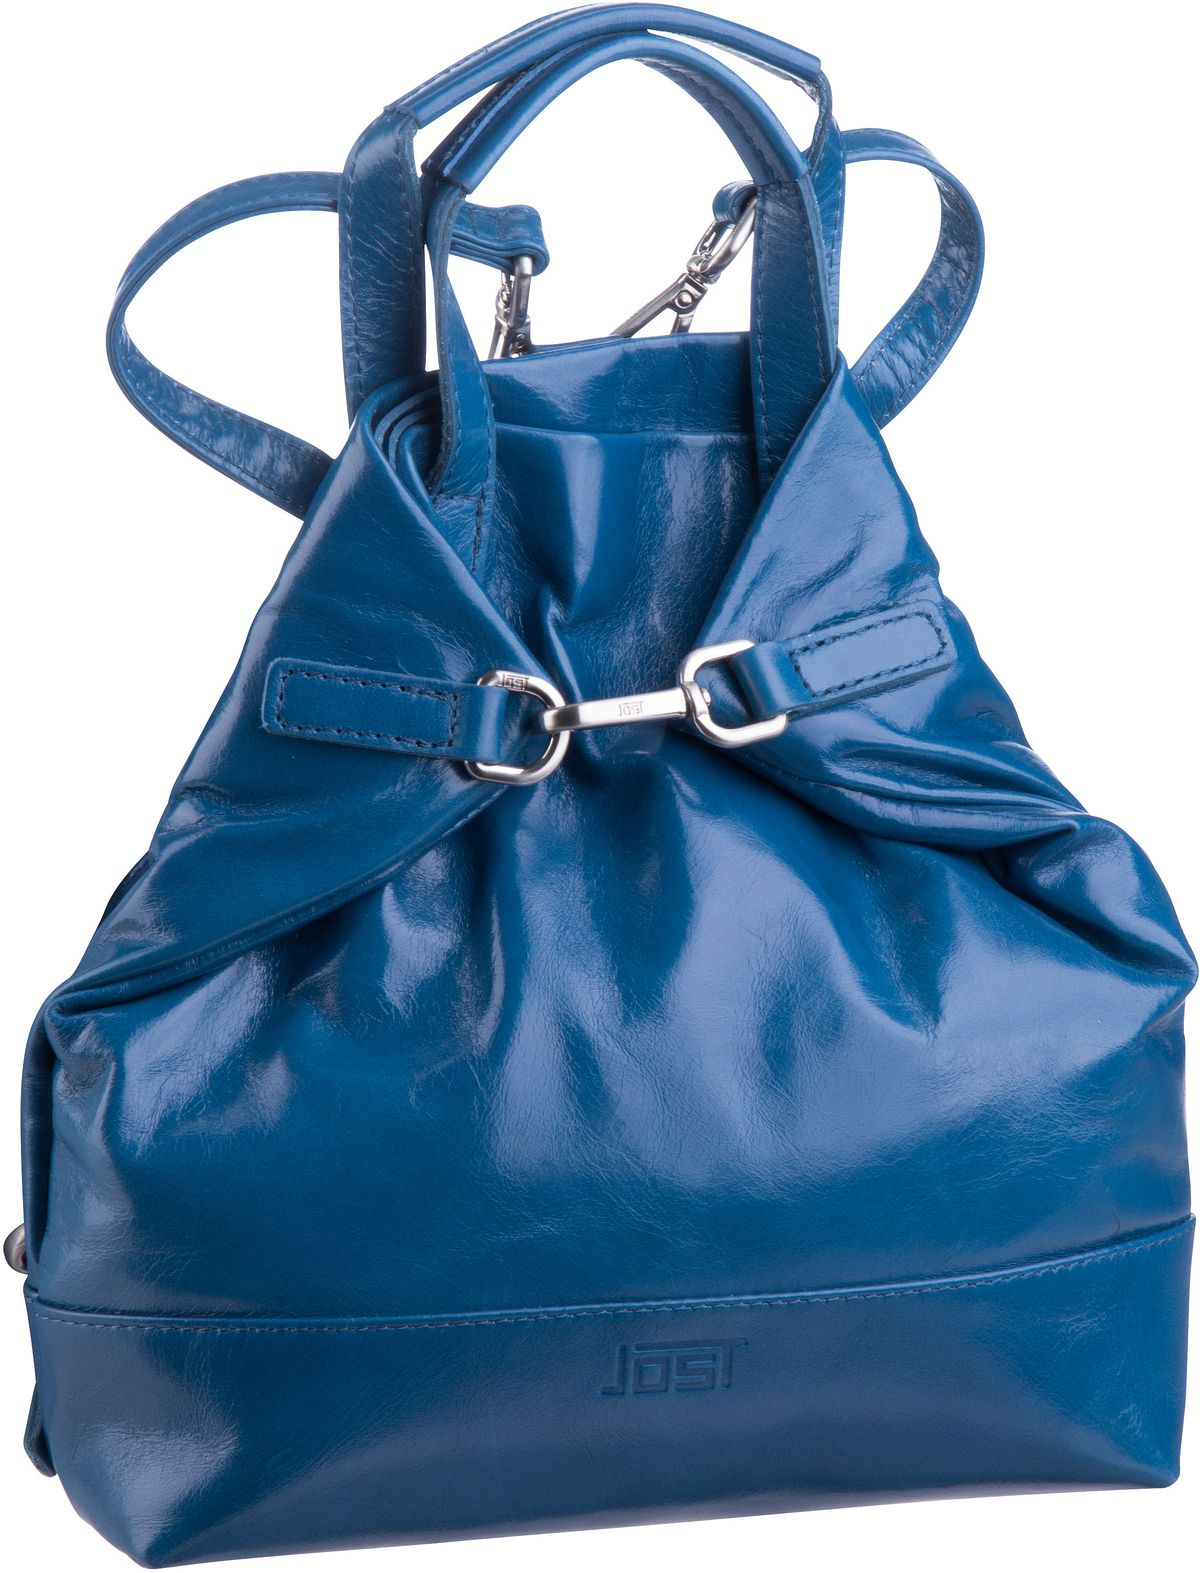 Rucksack / Daypack Boda 6617 X-Change Bag Mini Royalblue